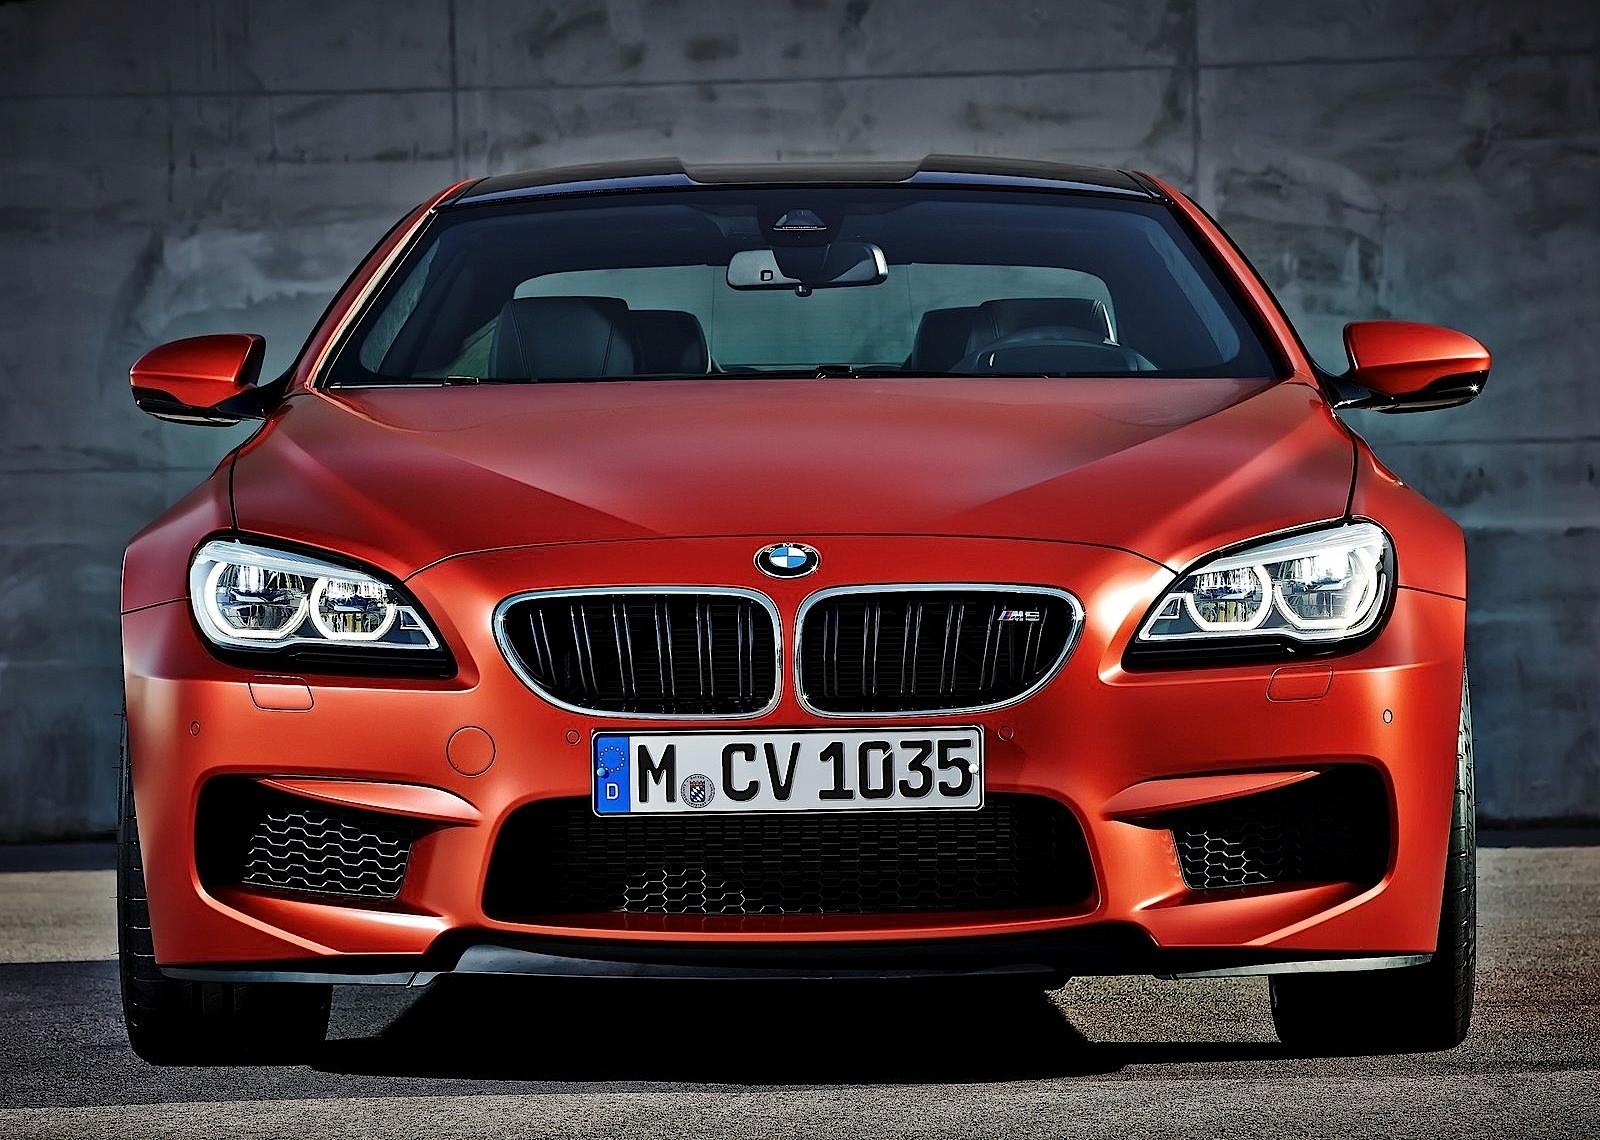 BMW M6 Coupe LCI specs - 2014, 2015, 2016, 2017, 2018 ...